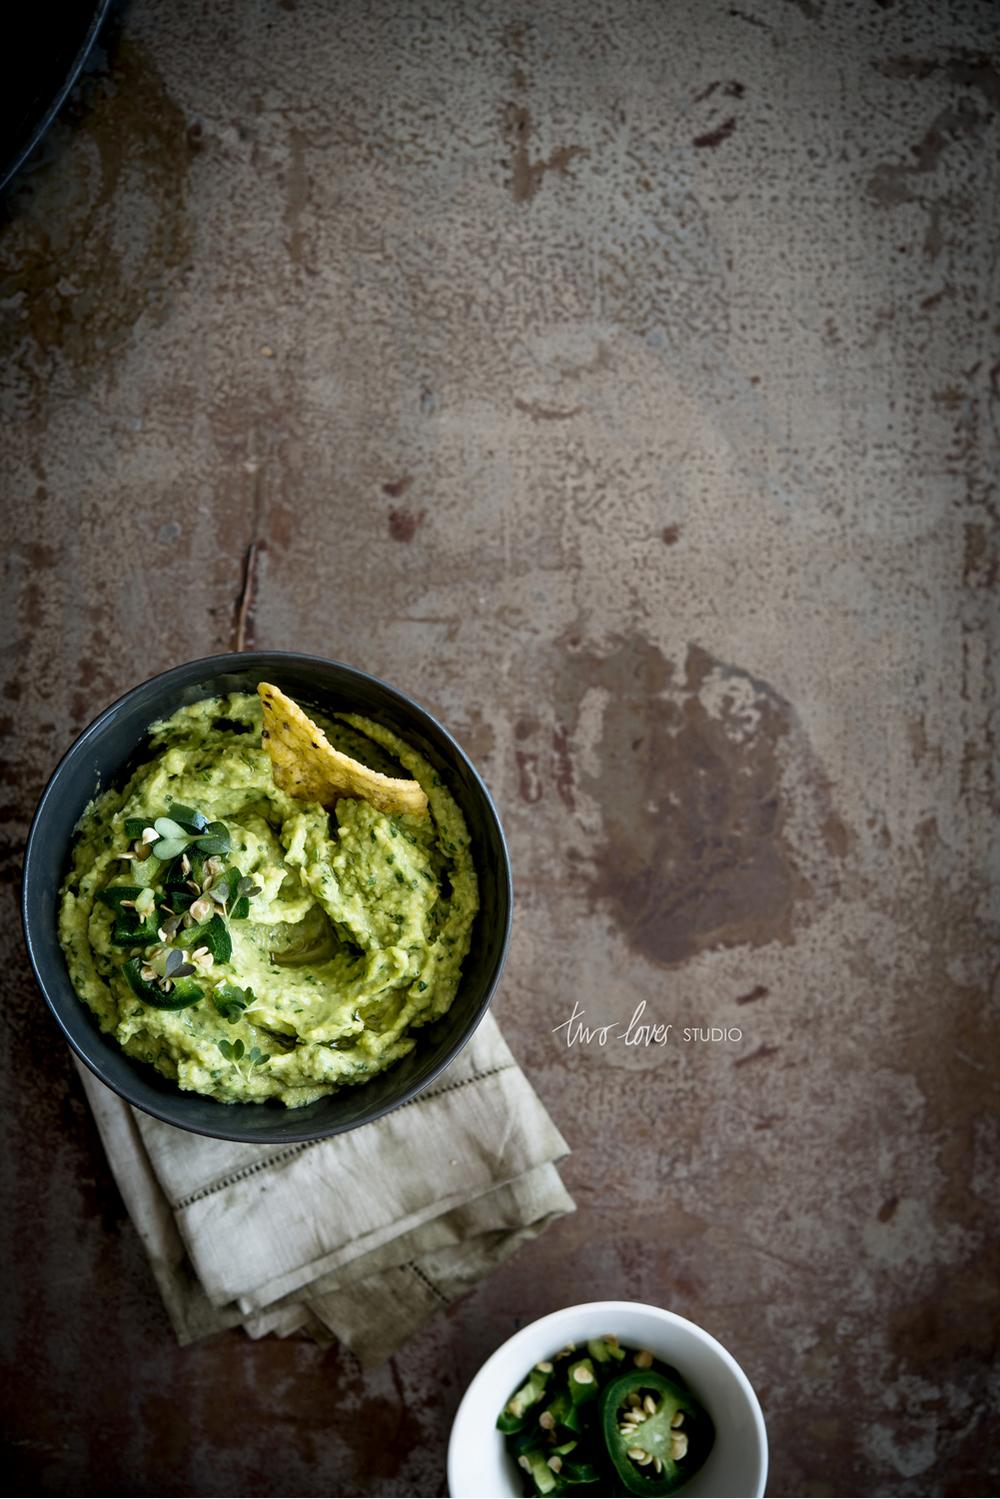 two-loves-studio-avocado-jalapeño-dip2w